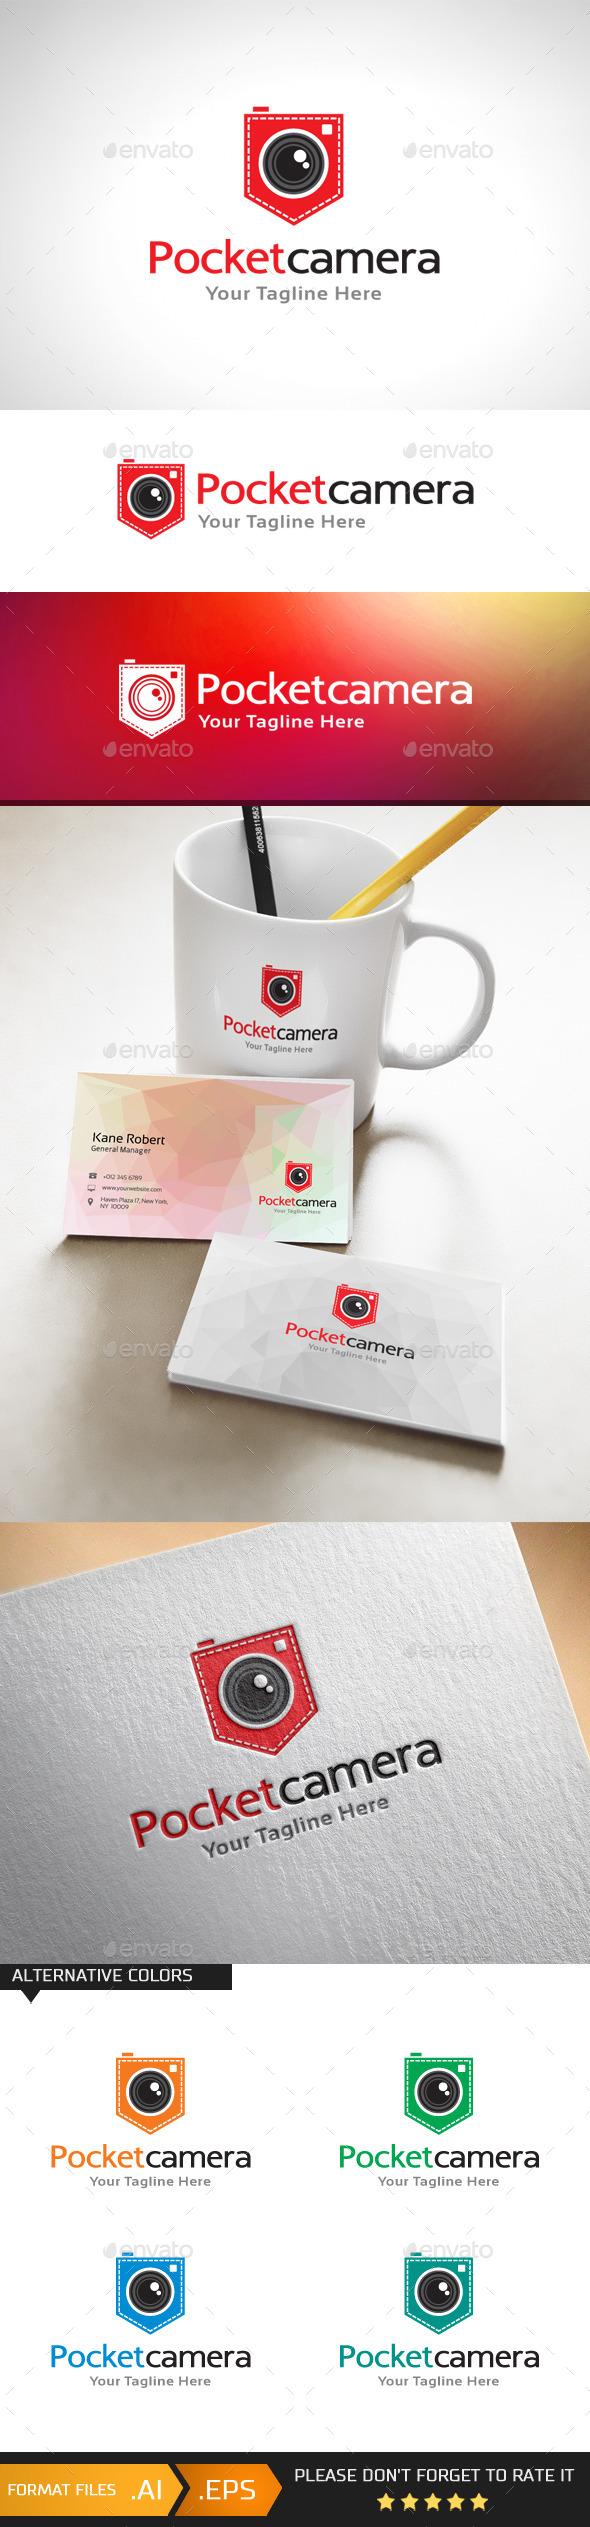 Pocket Camera Logo Template